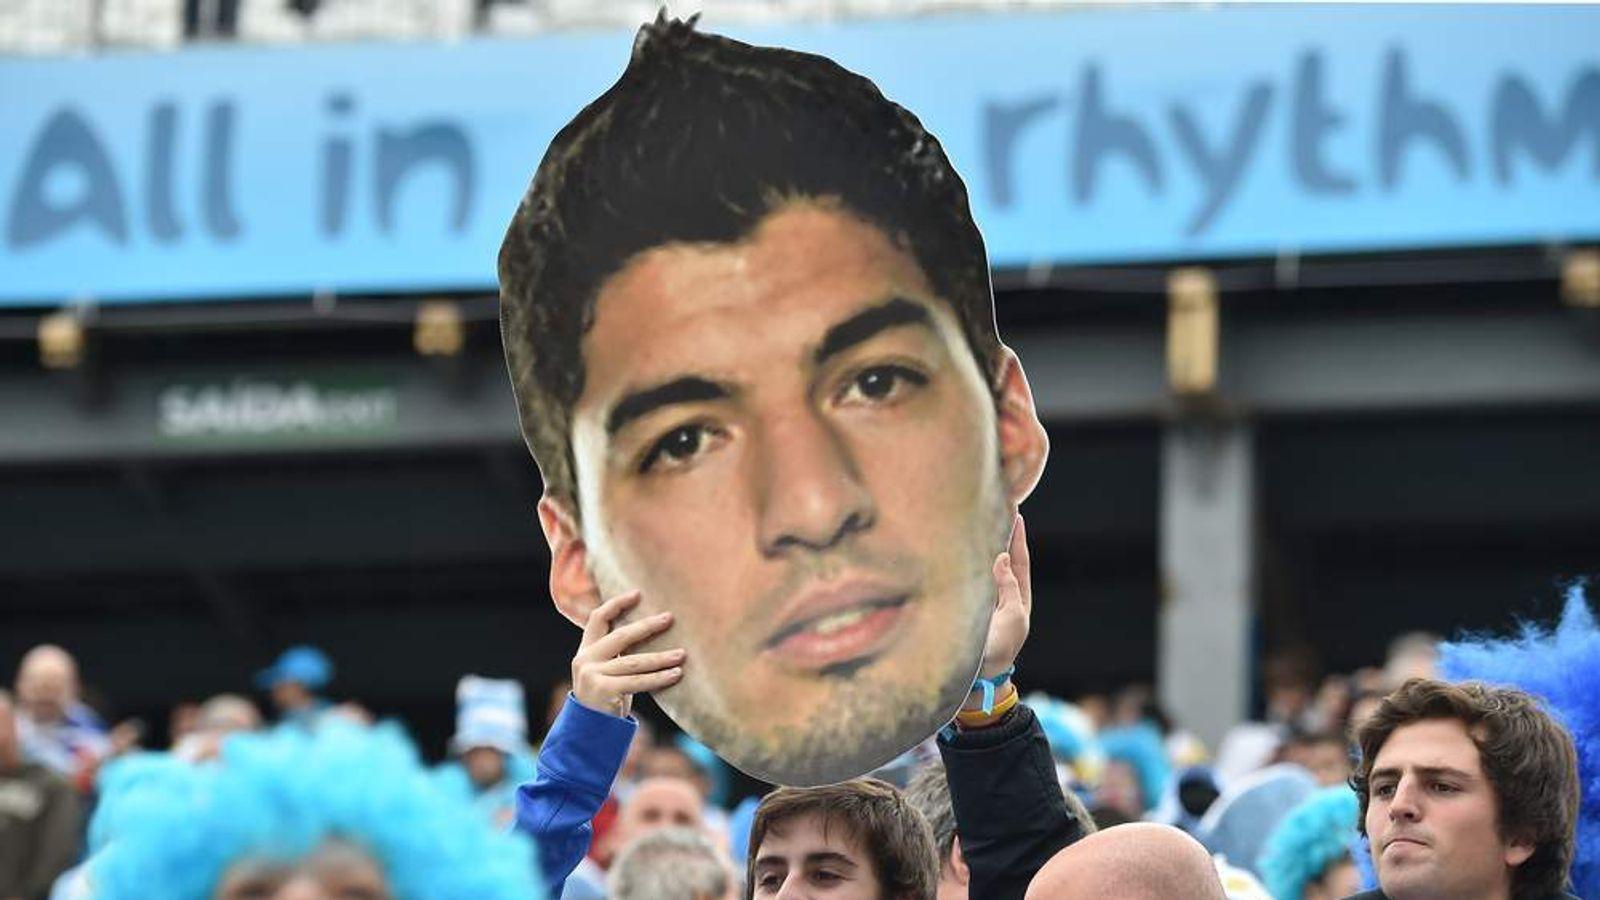 Uruguayan fans hold a giant board depecting Uruguay's forward Luis Suarez